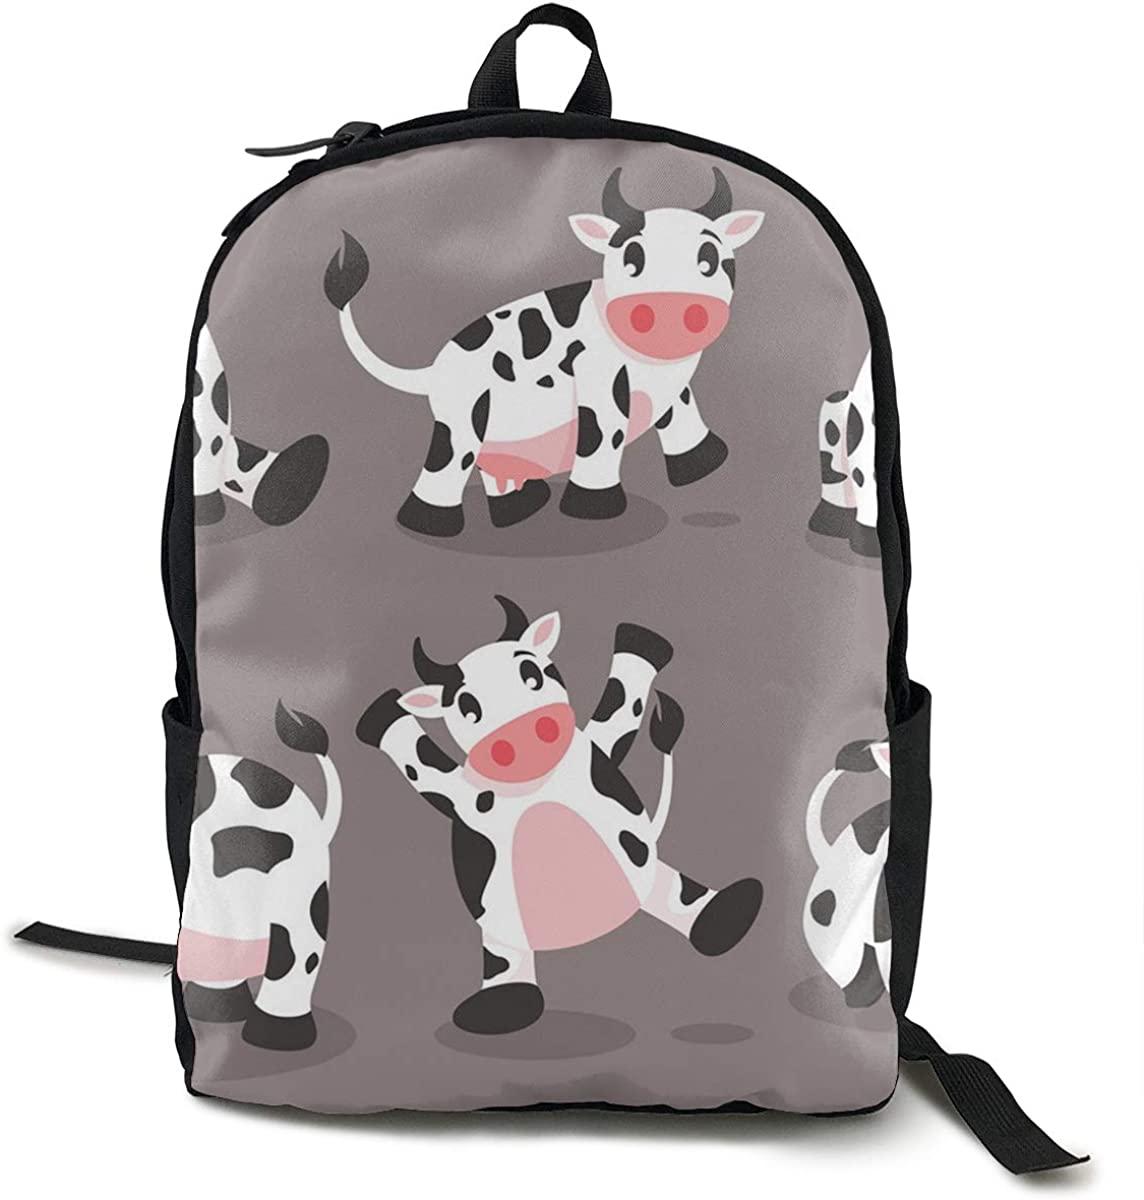 O-X_X-O Unisex Lightweight Polyester Backpack Rucksack Travel Laptop School Bag